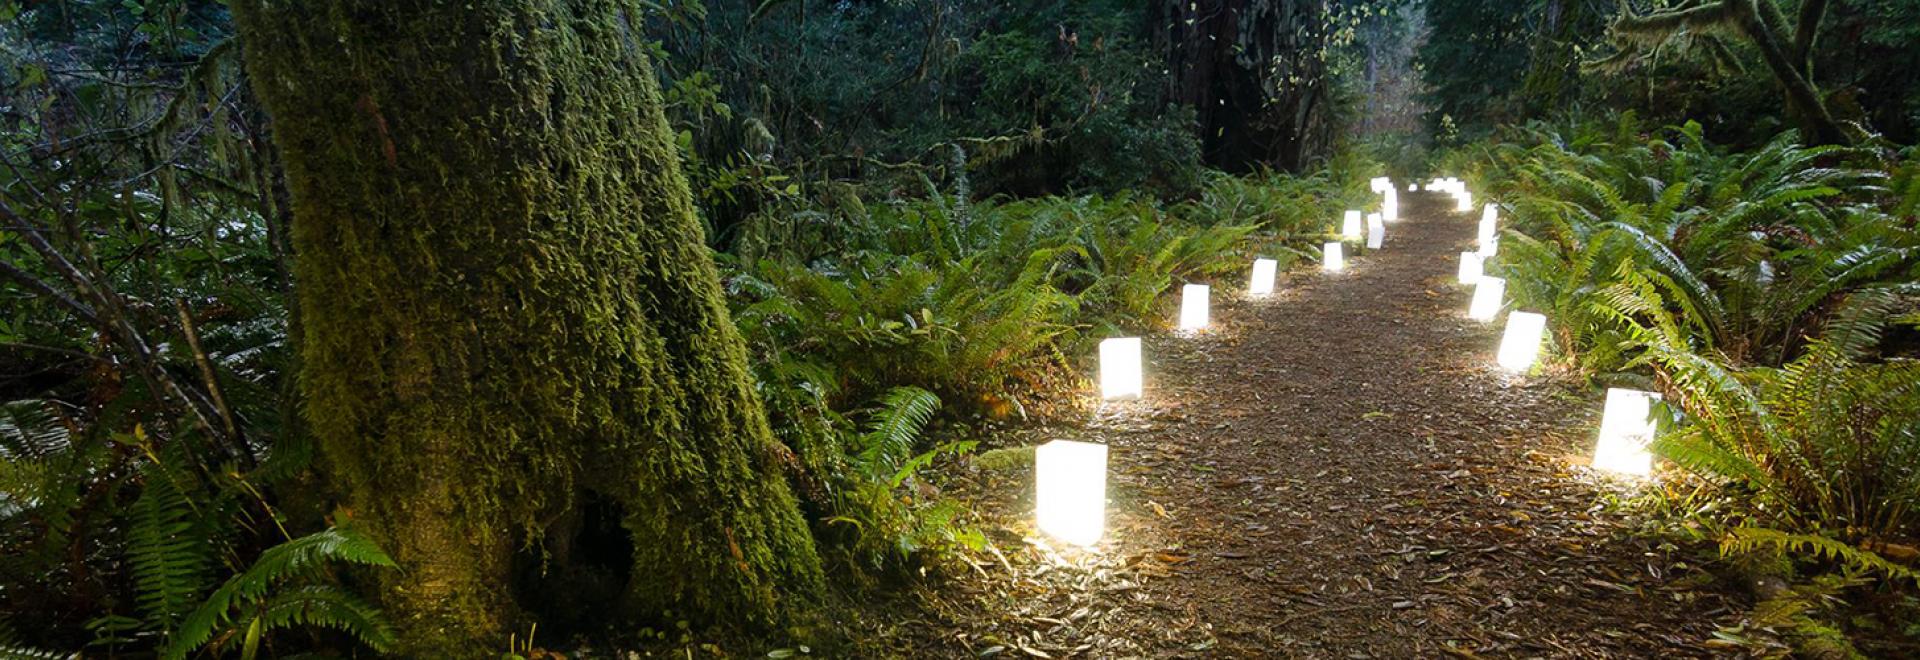 Luminaries along the trail at the Prairie Creek Candlelight Walk